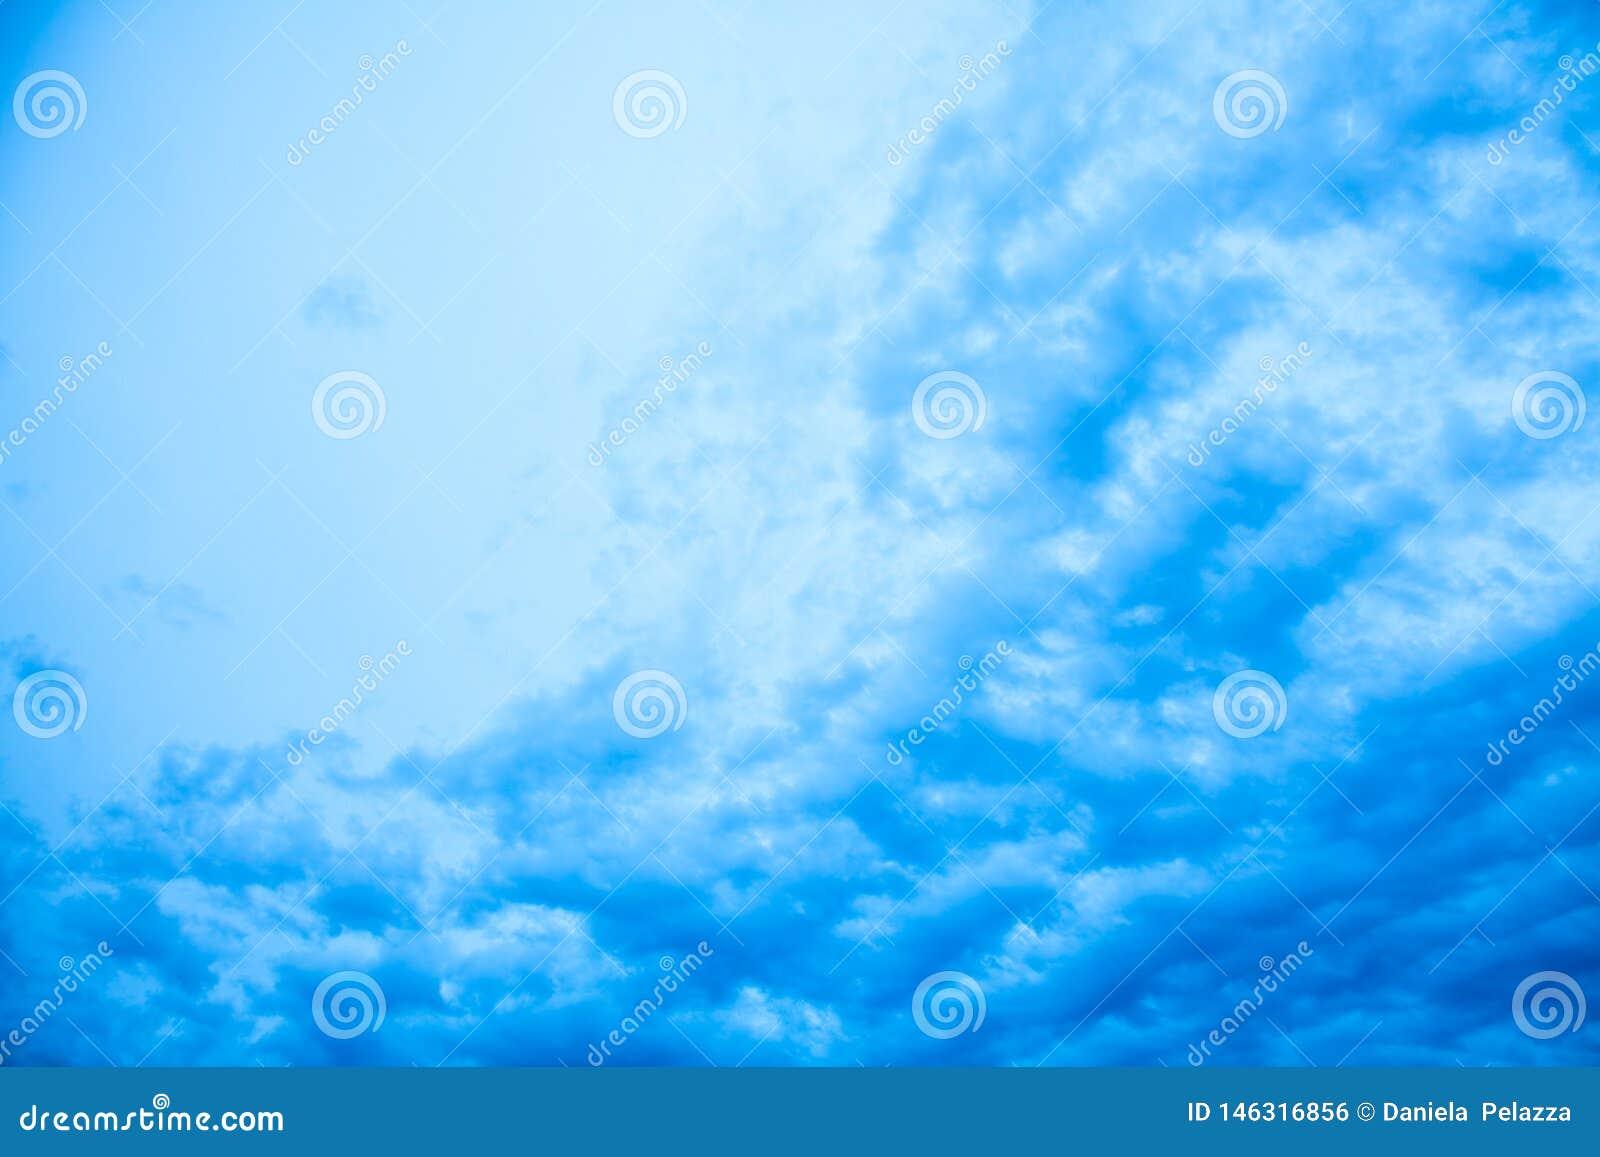 Abstracte blauwe horizontale achtergrond